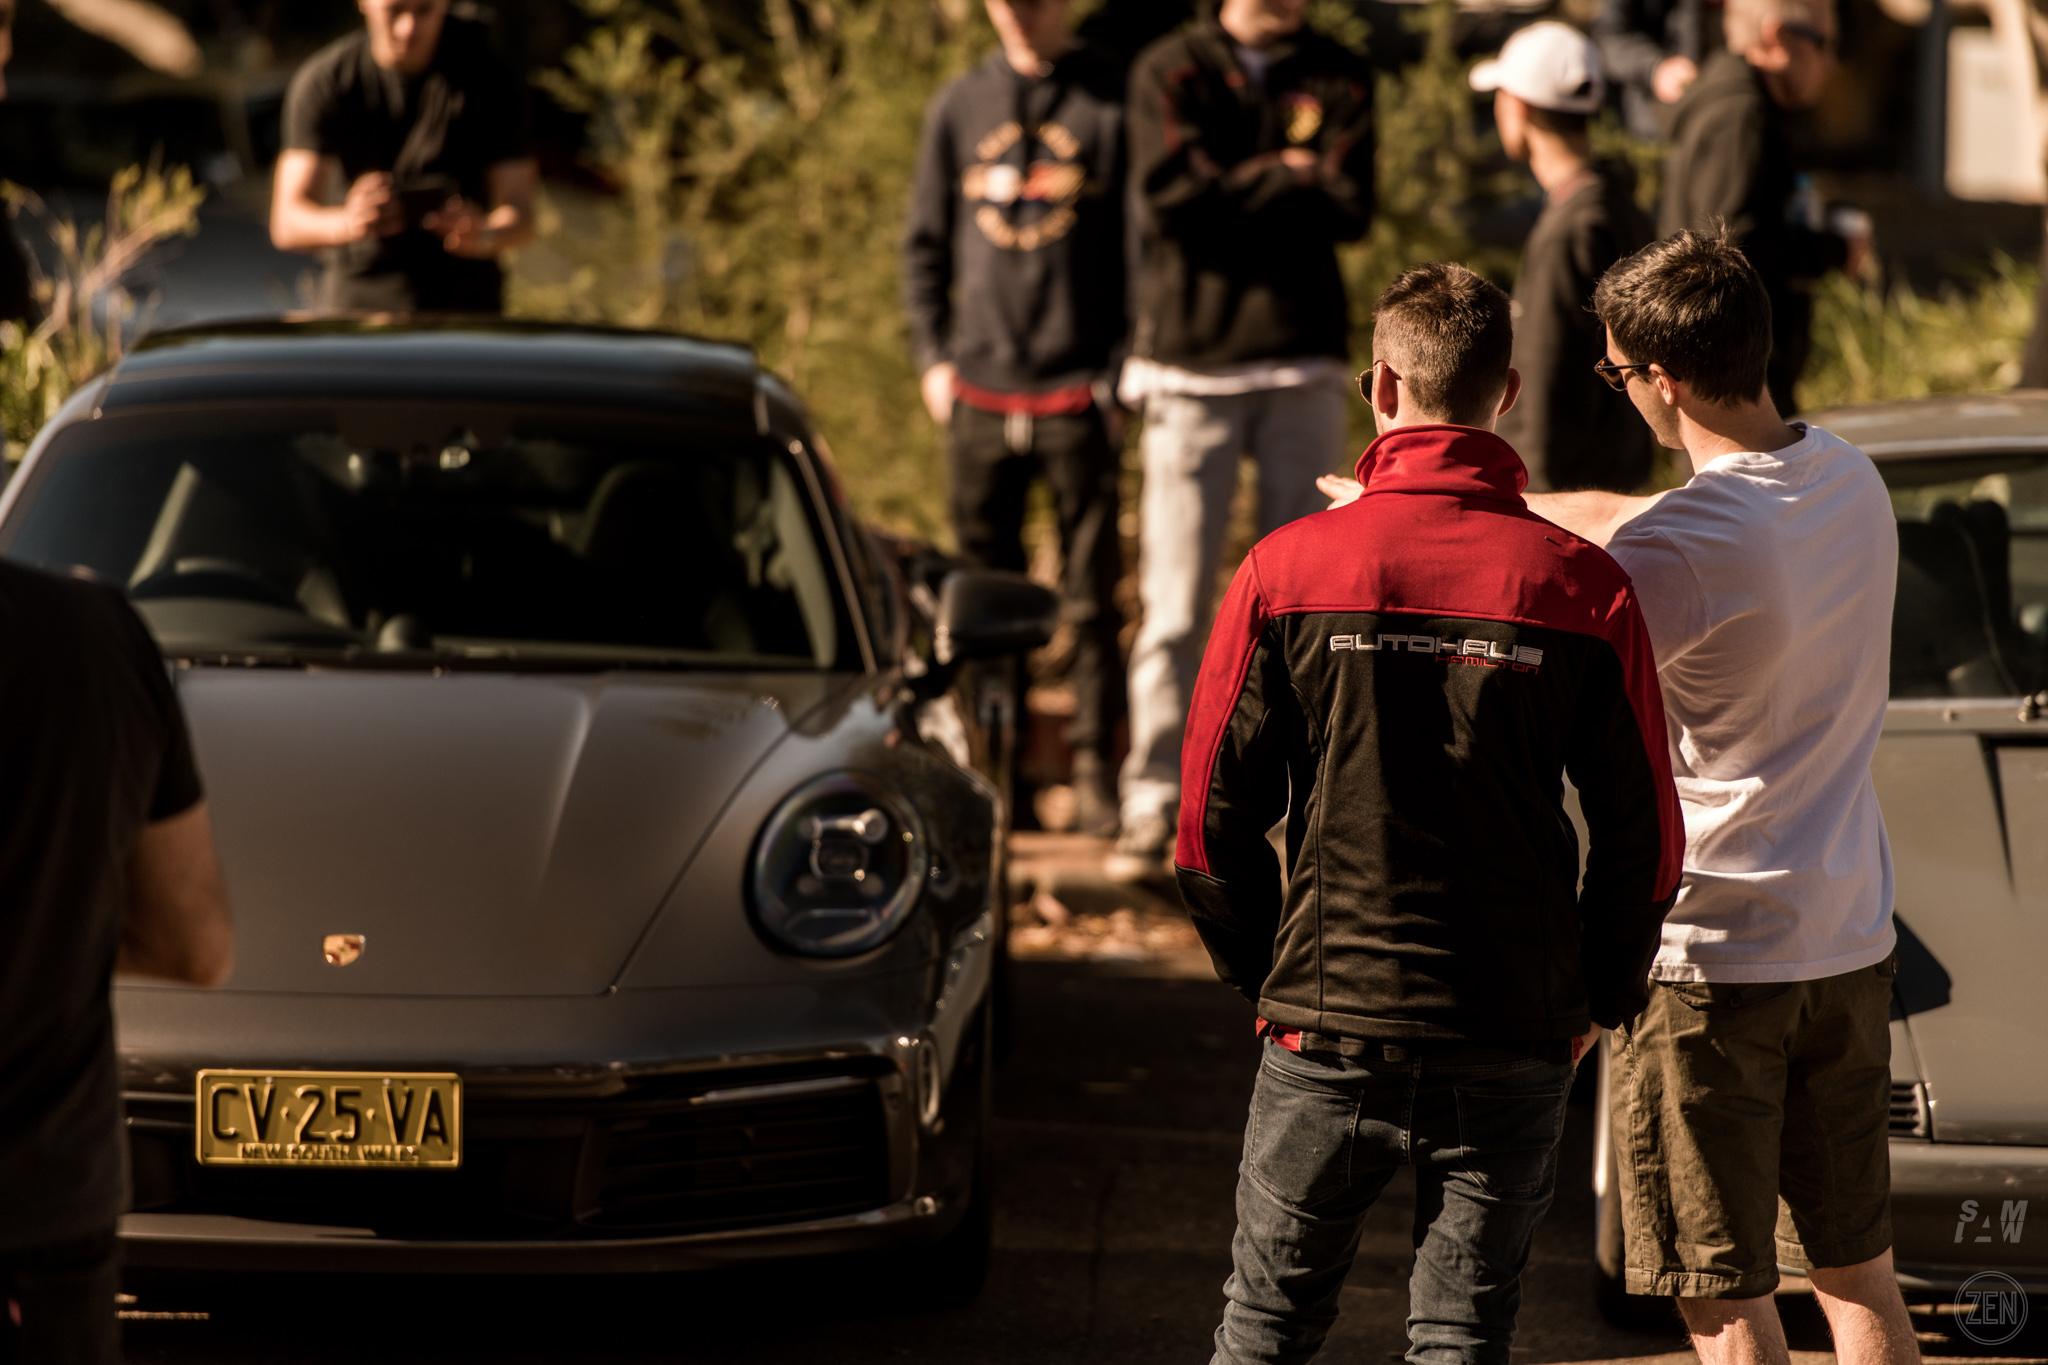 2019-10-27 - Autohaus Porsches & Coffee 144